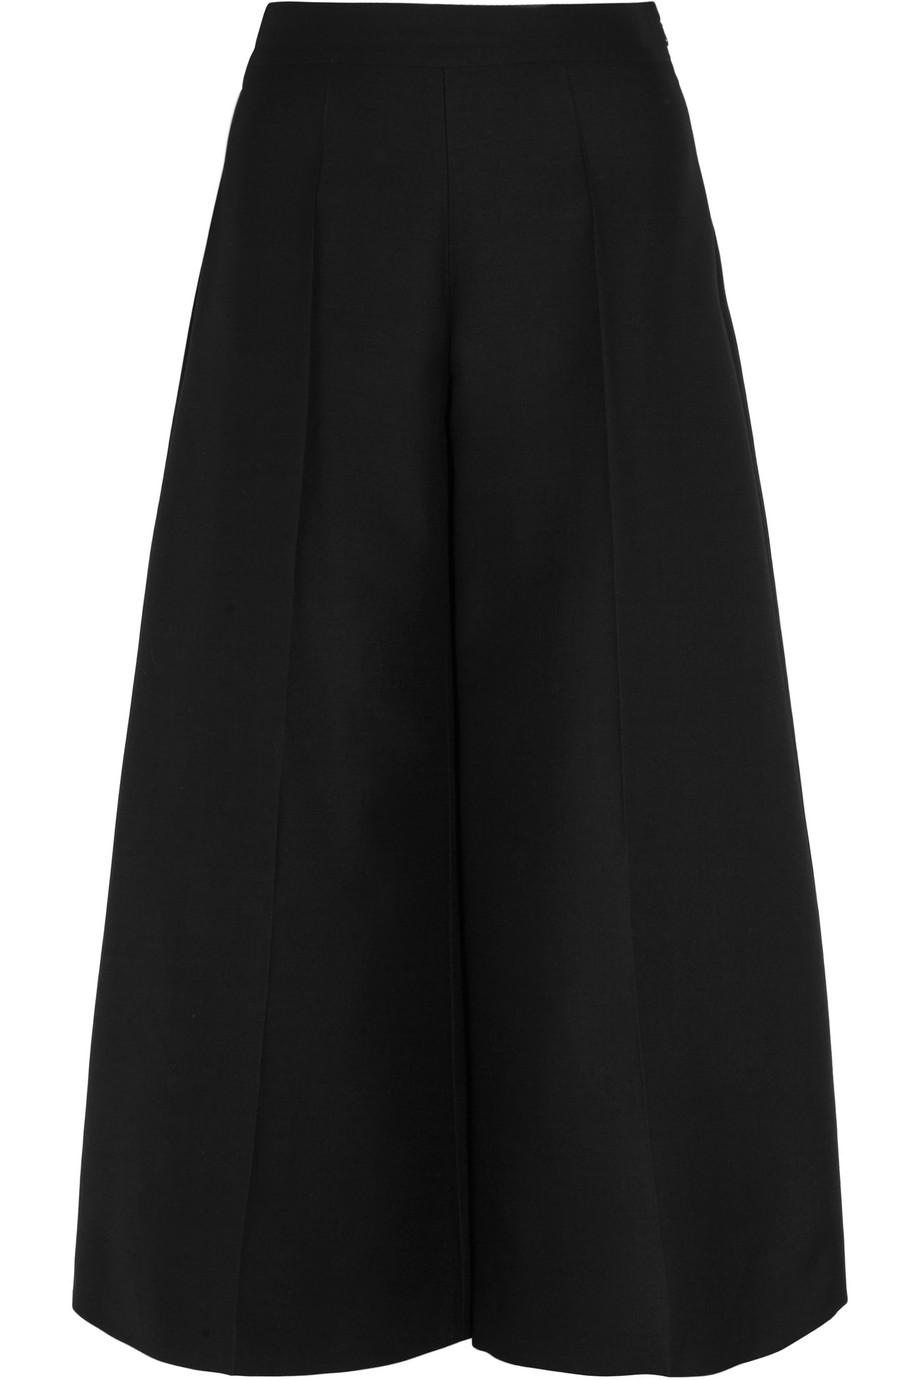 Valentino Wool-Crepe Wide-Leg Culottes, Black, Women's, Size: 44